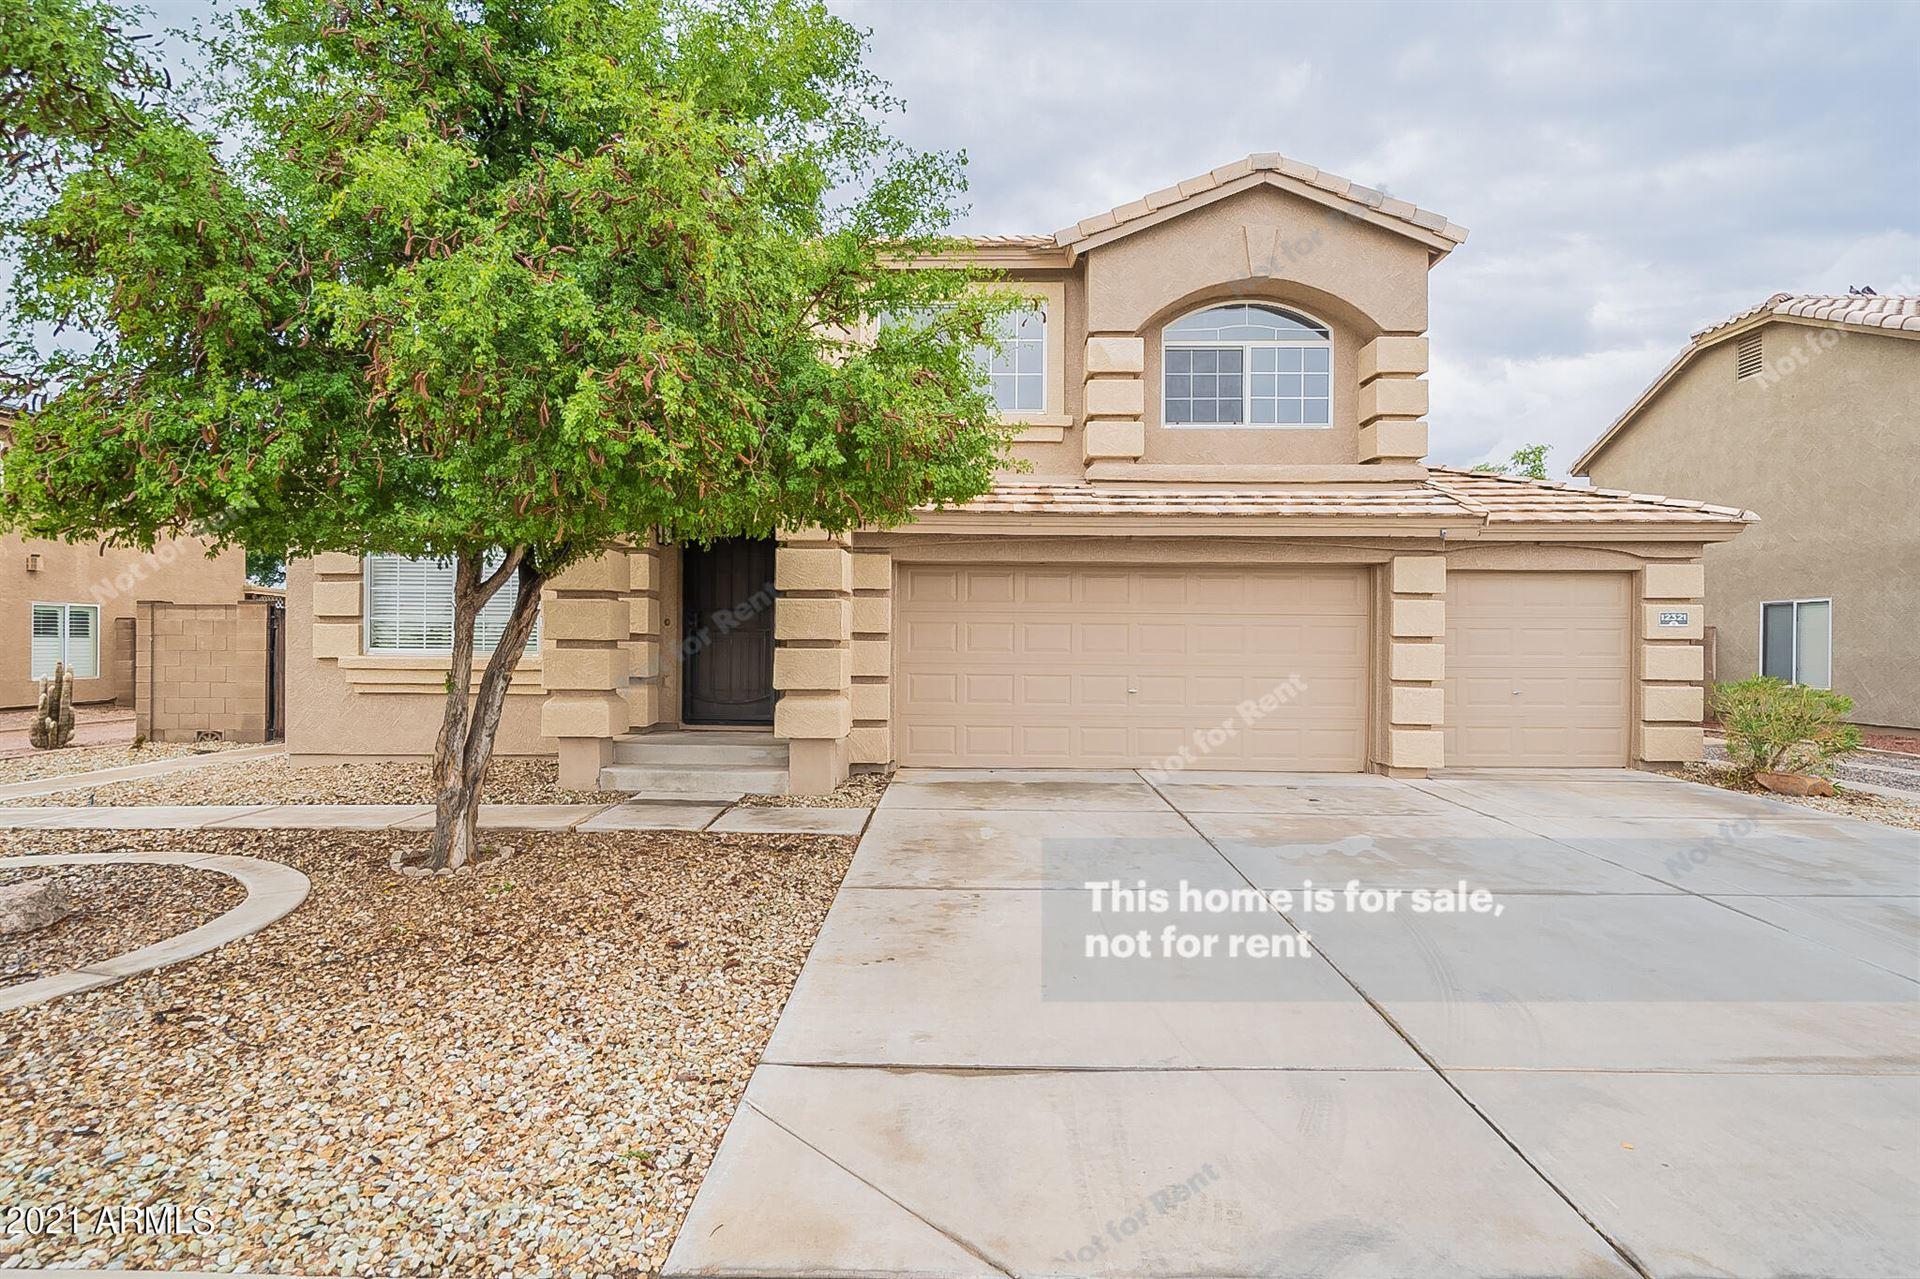 Photo of 12321 W CANTERBURY Drive, El Mirage, AZ 85335 (MLS # 6293742)